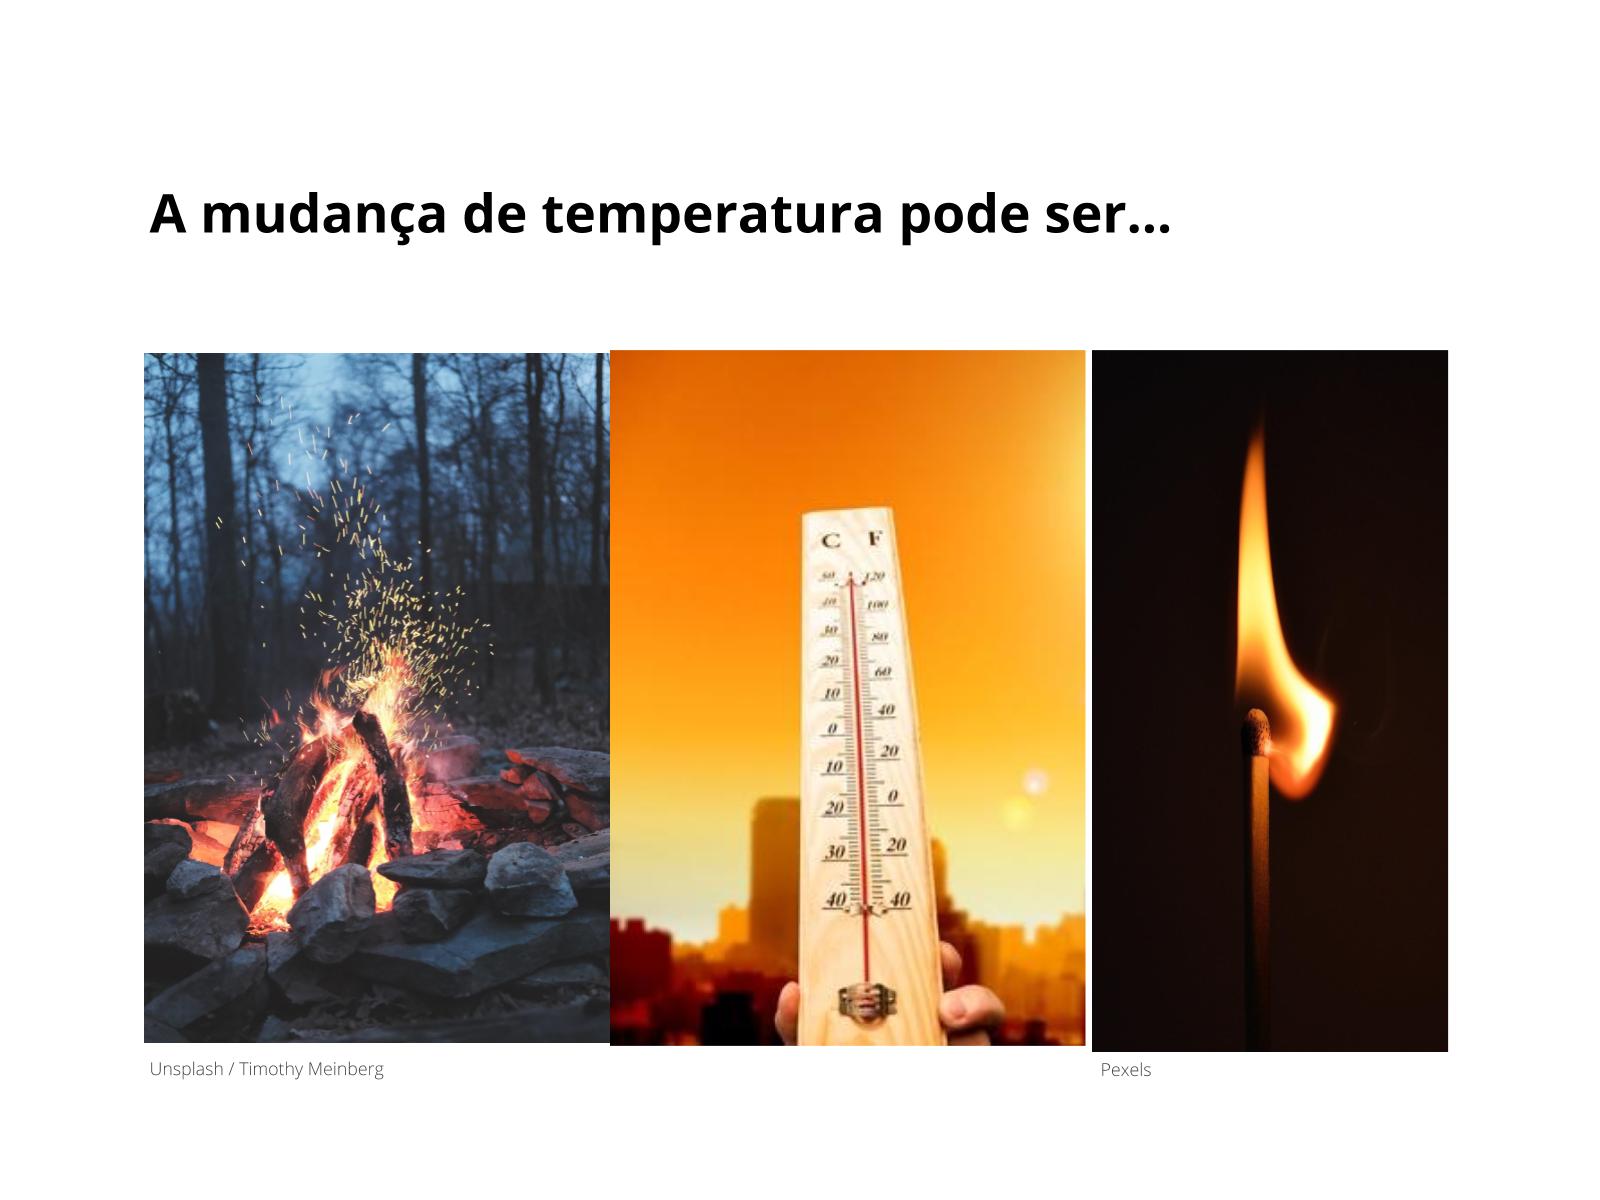 Explicando a Mudança de Temperatura